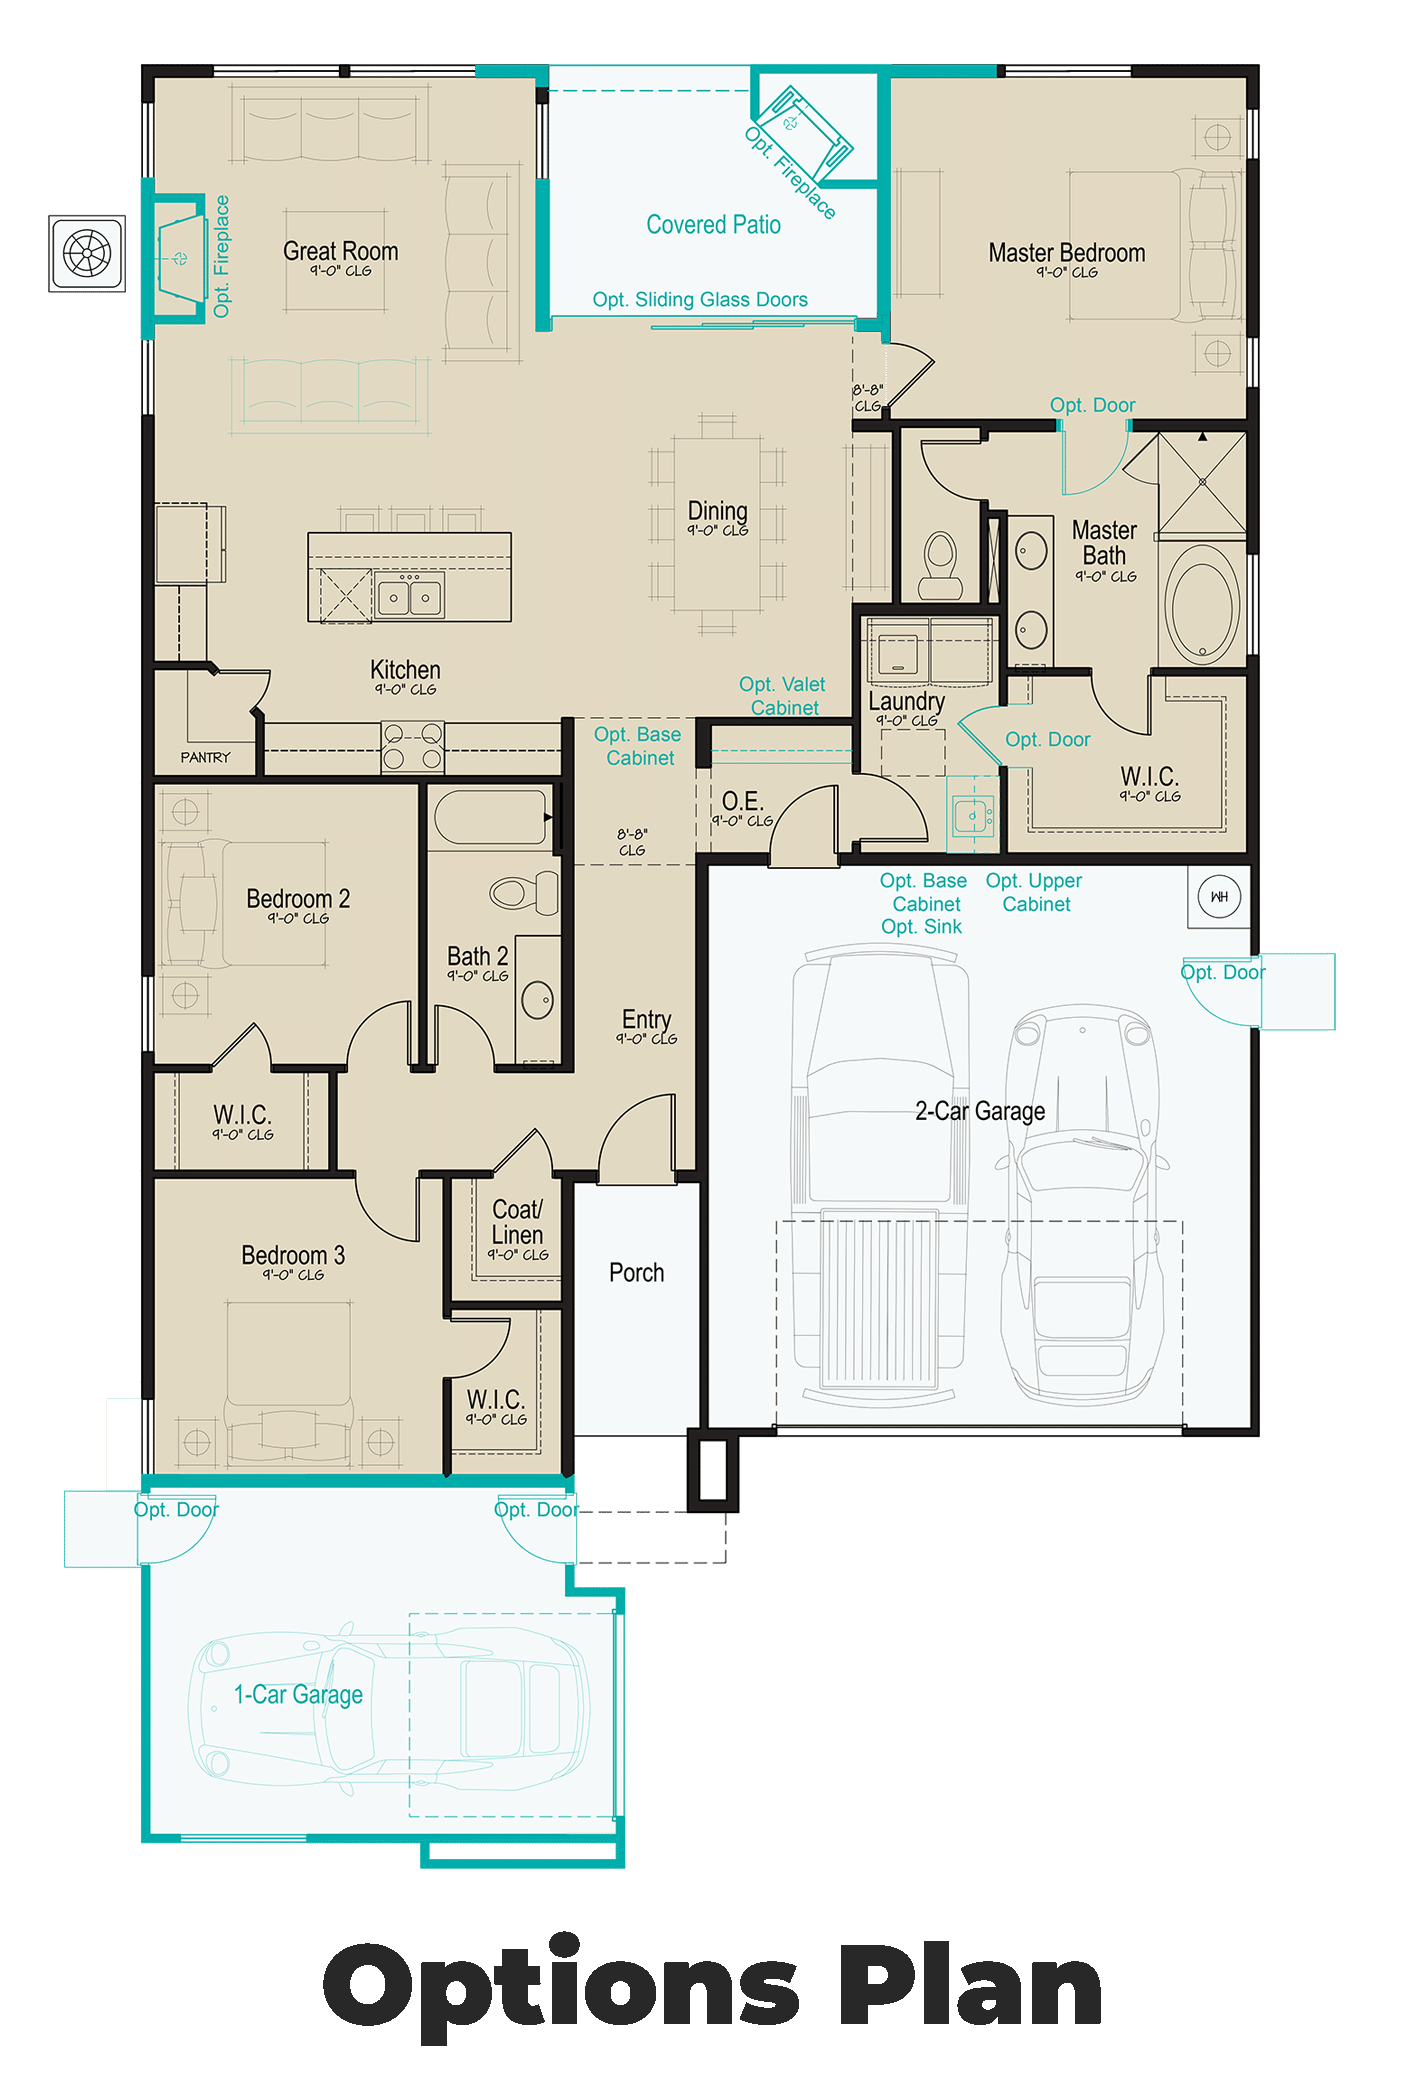 new-homes-golden-valley-estancia-floorplan-3-1739-options-2-17-21